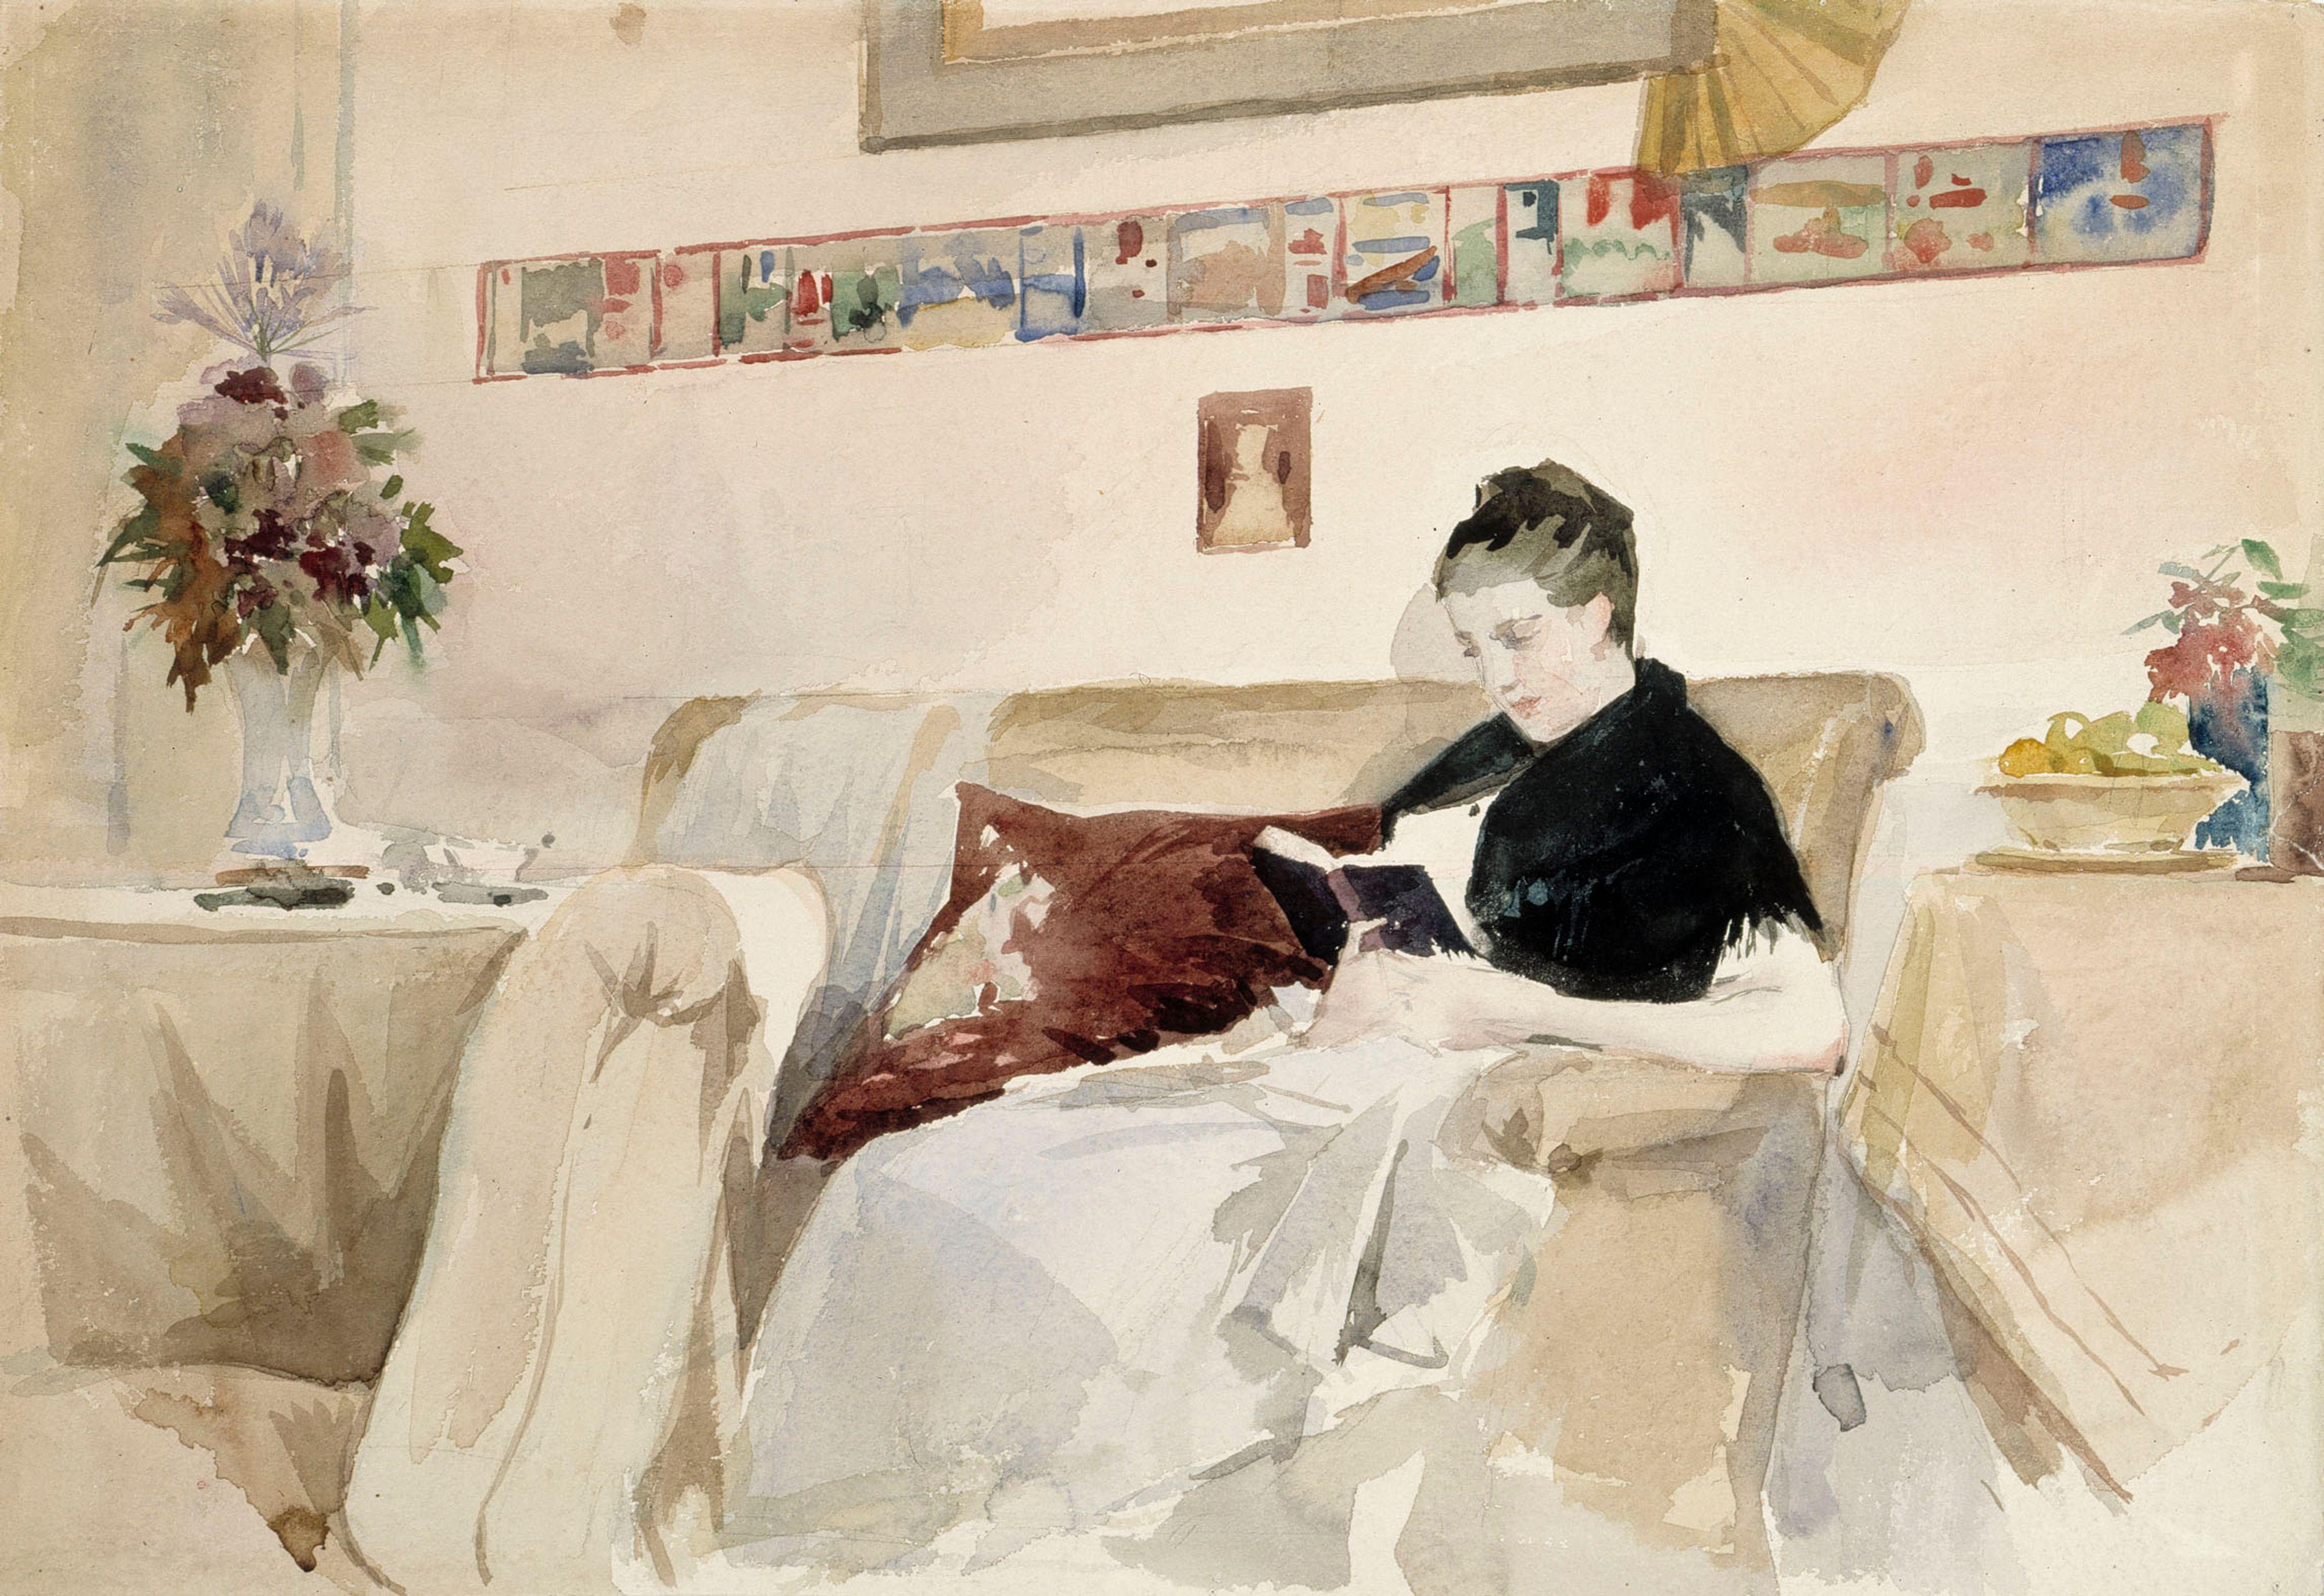 sofa art gallery teddy fabric reviews file albert edelfelt artist s wife reading on the a iii 2022 41 finnish national jpg